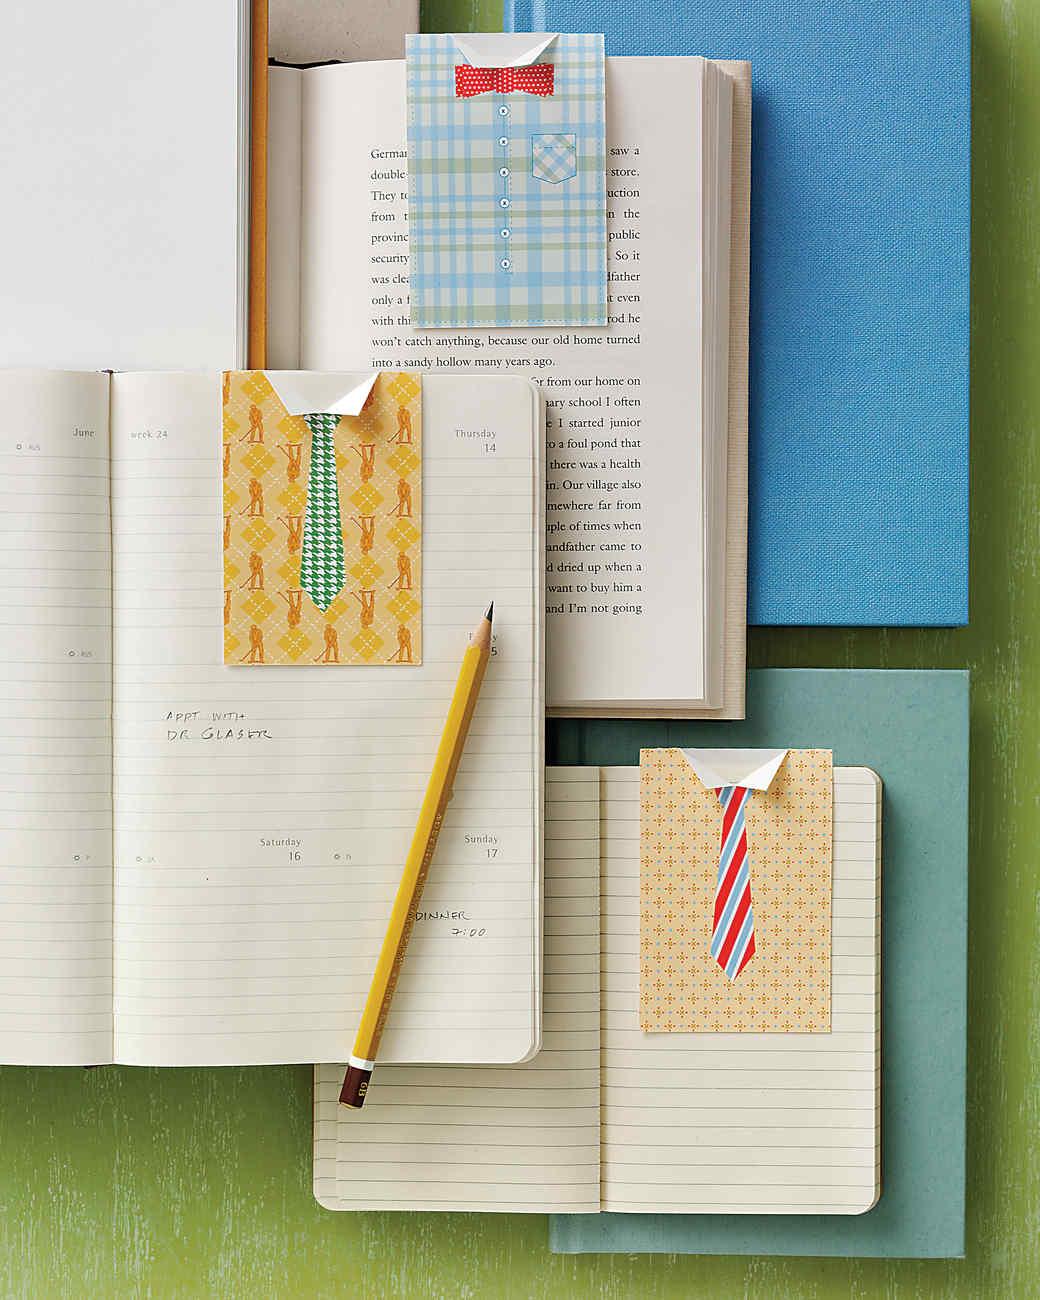 mld102939_0607_booksmarks.jpg